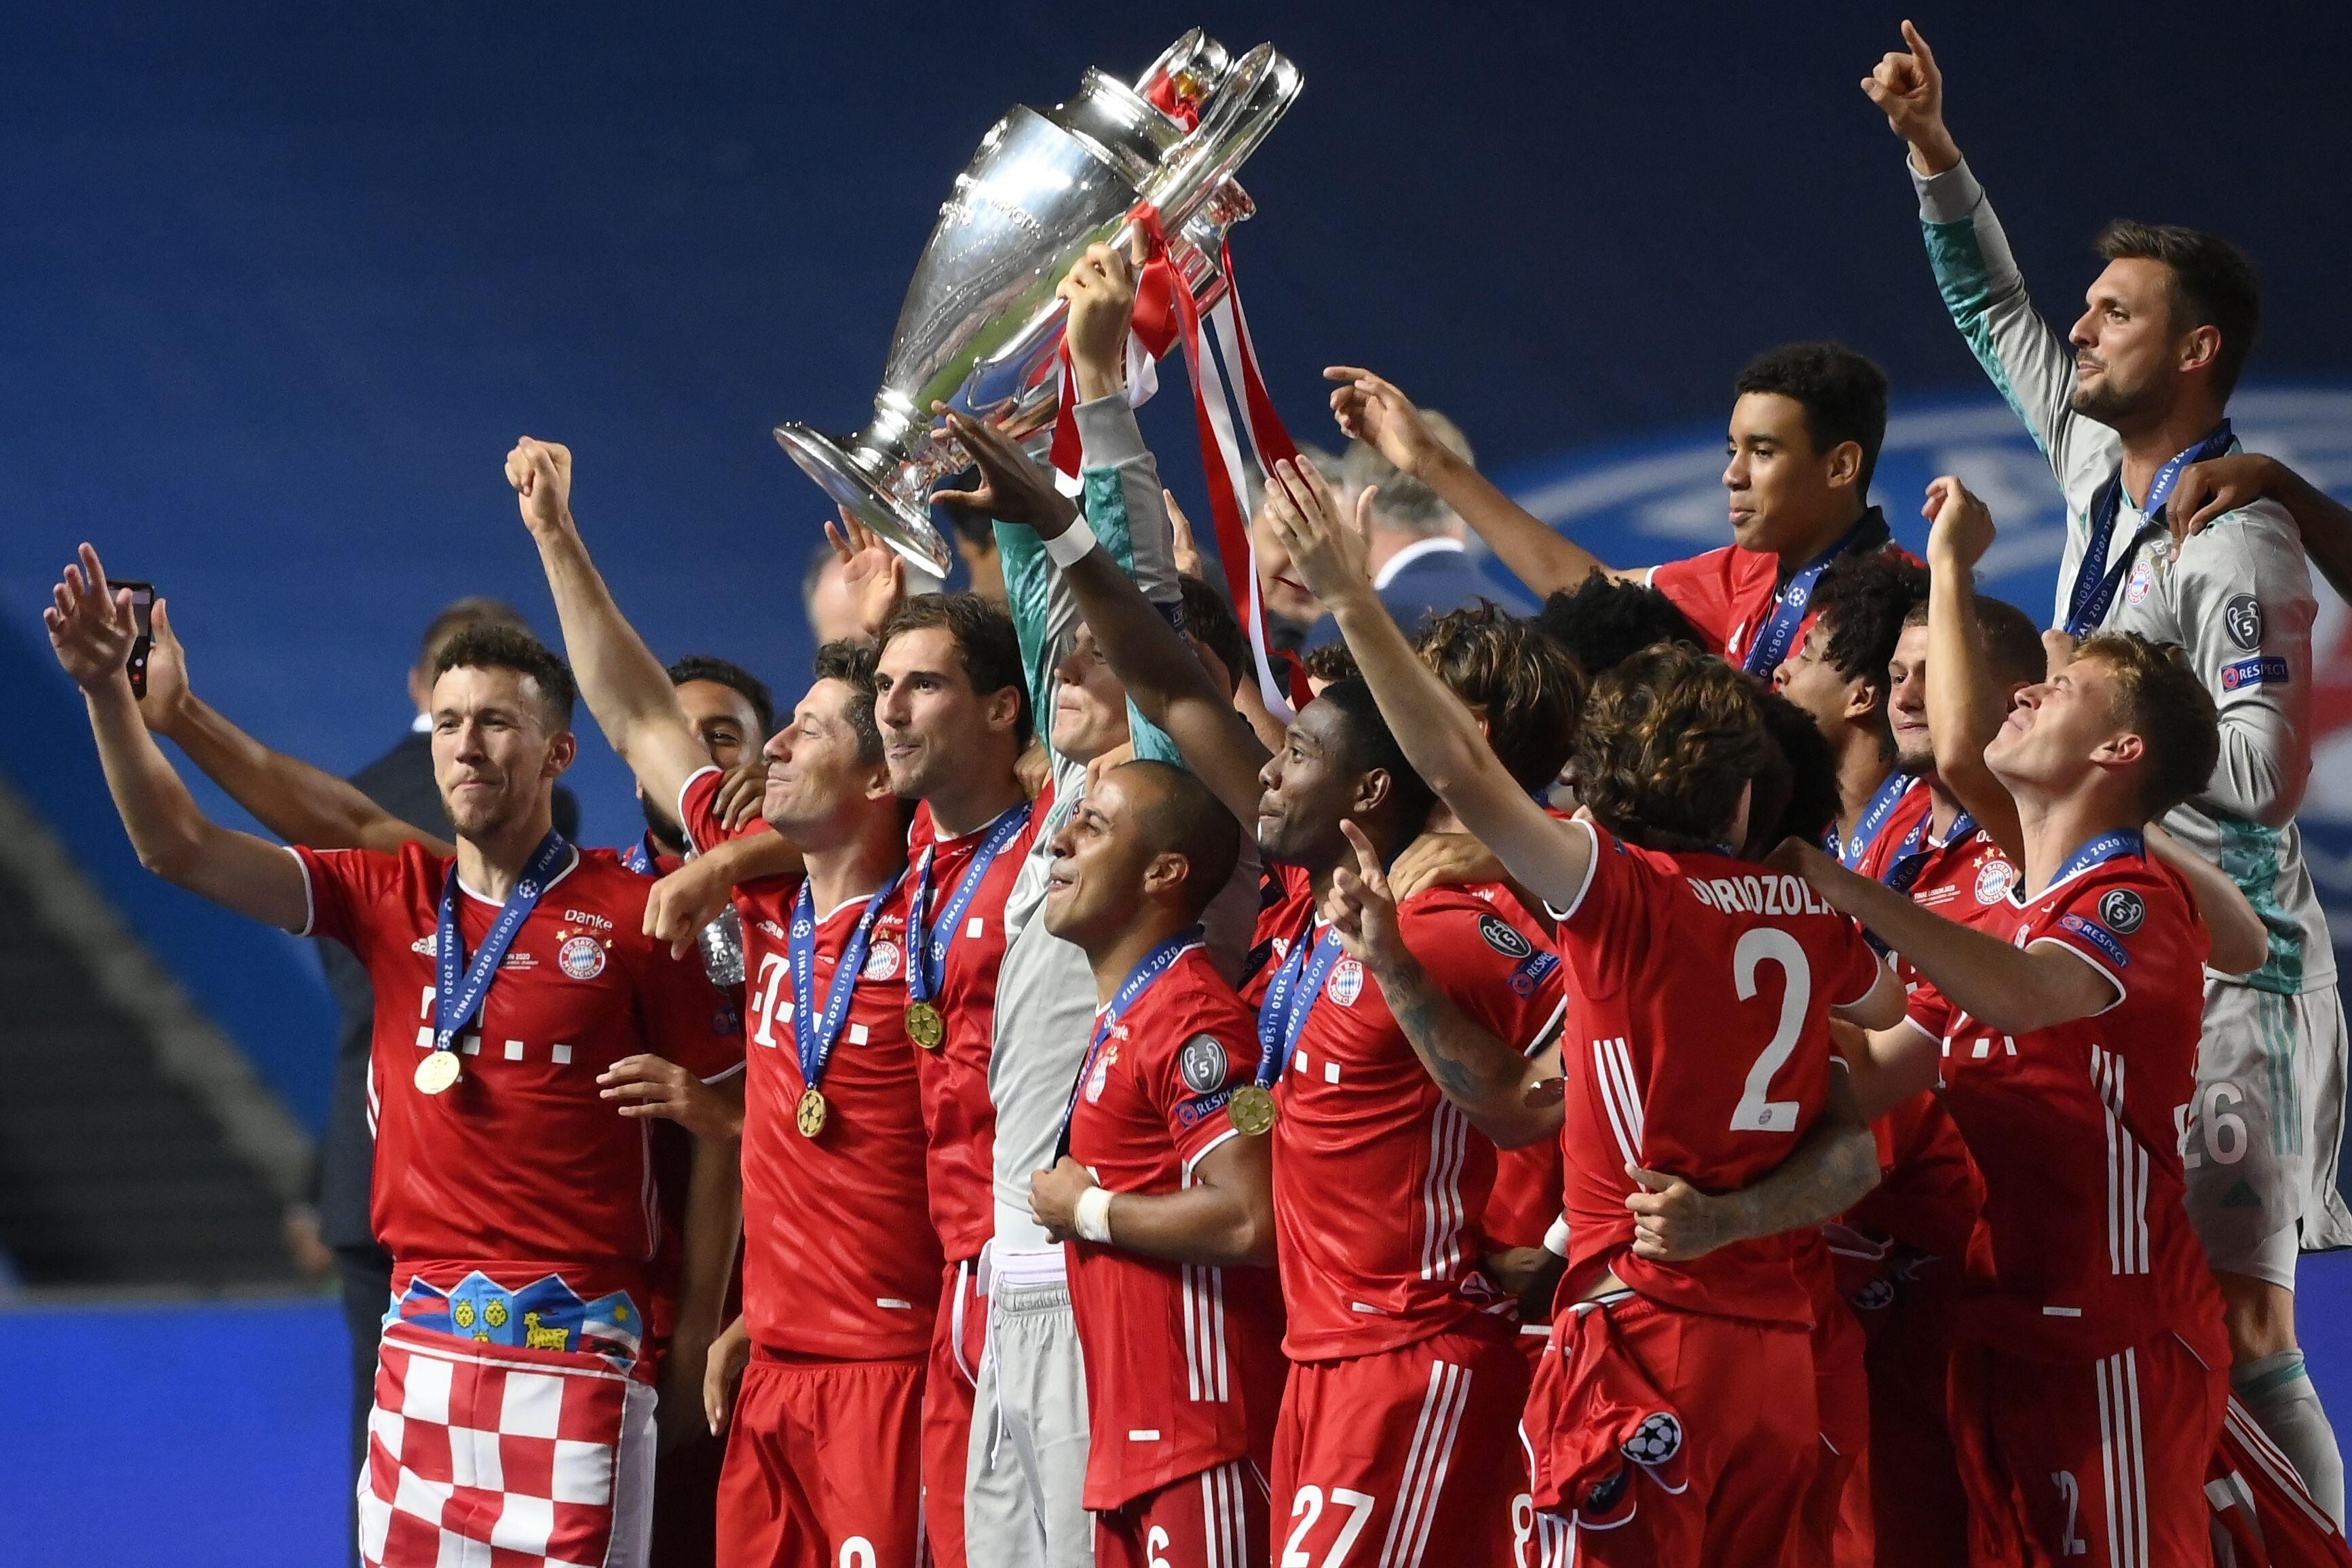 Brilliant Bayern Munich Worthy Winners In Strangest Champions League Season Yet South China Morning Post